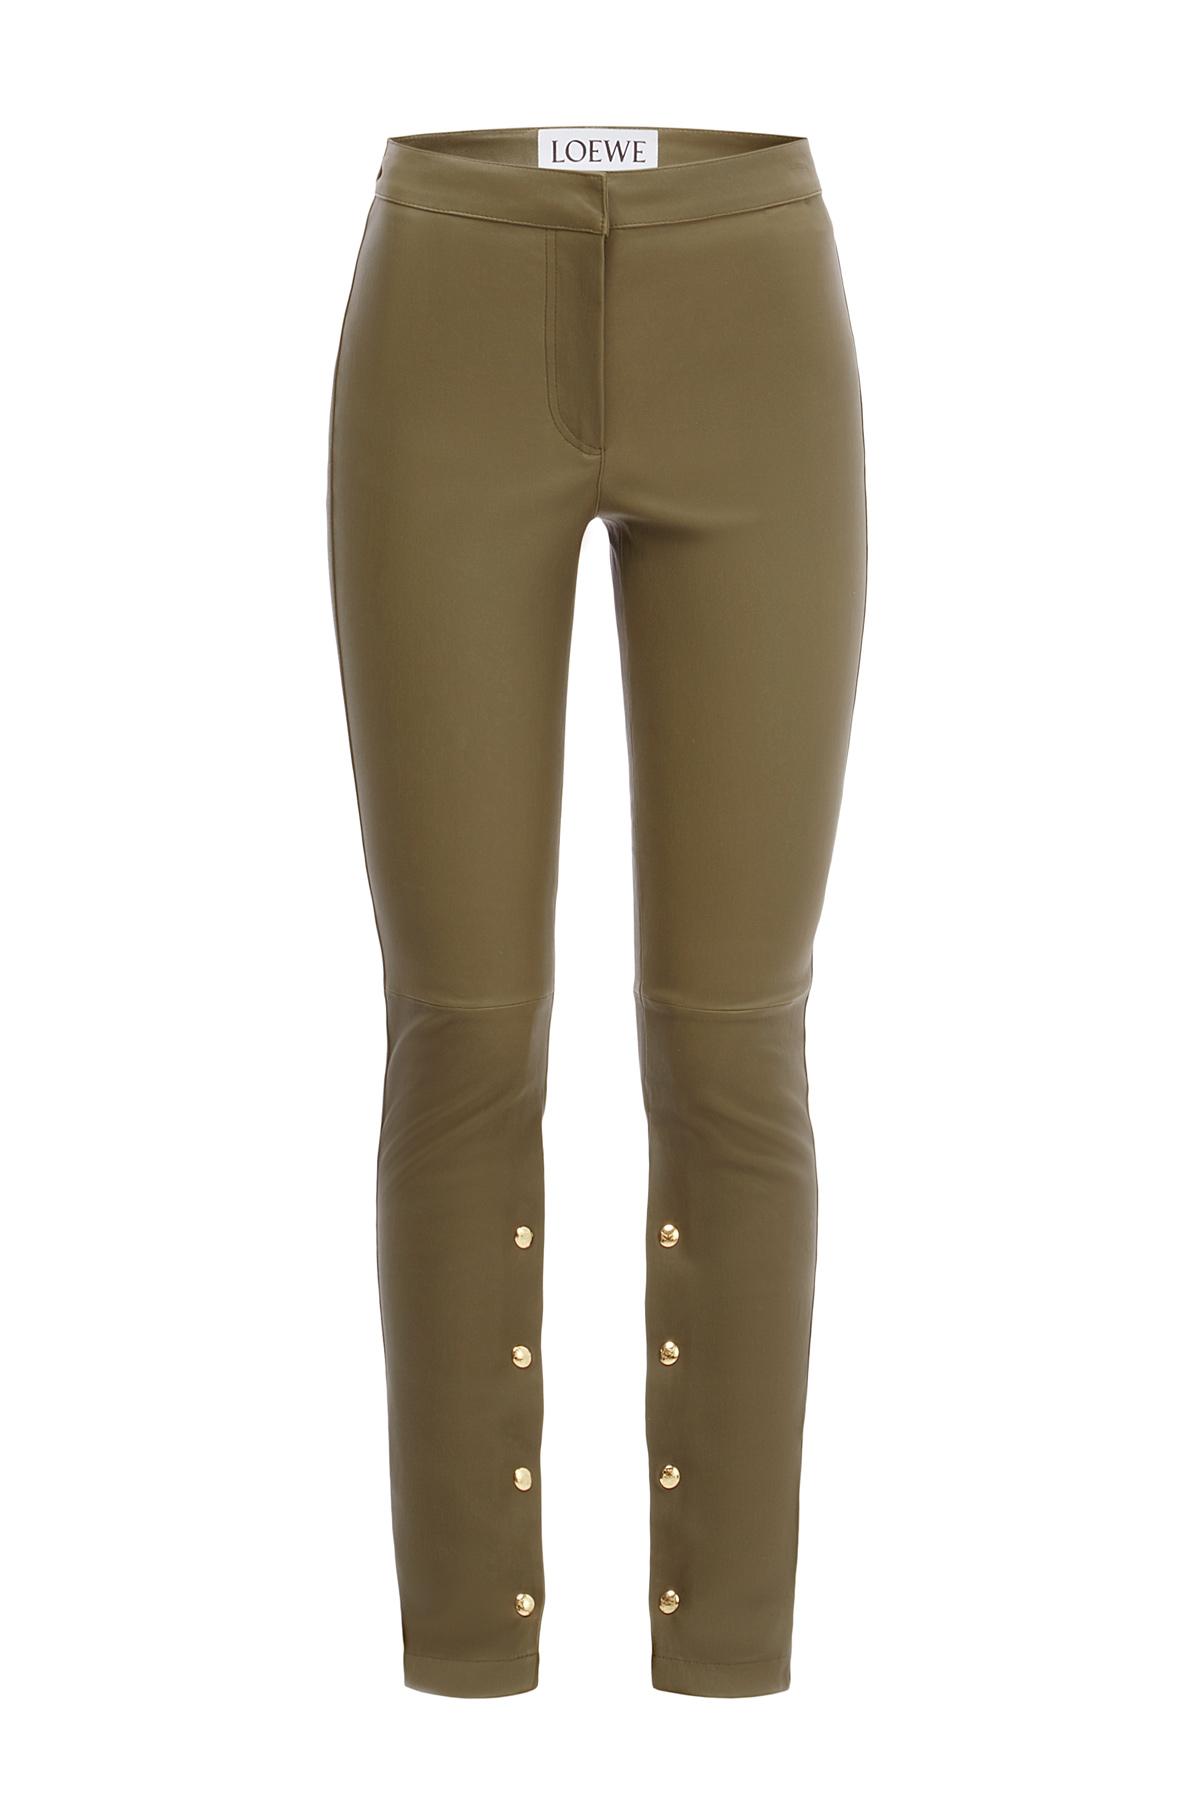 LOEWE Stretch Trousers Khaki Green front